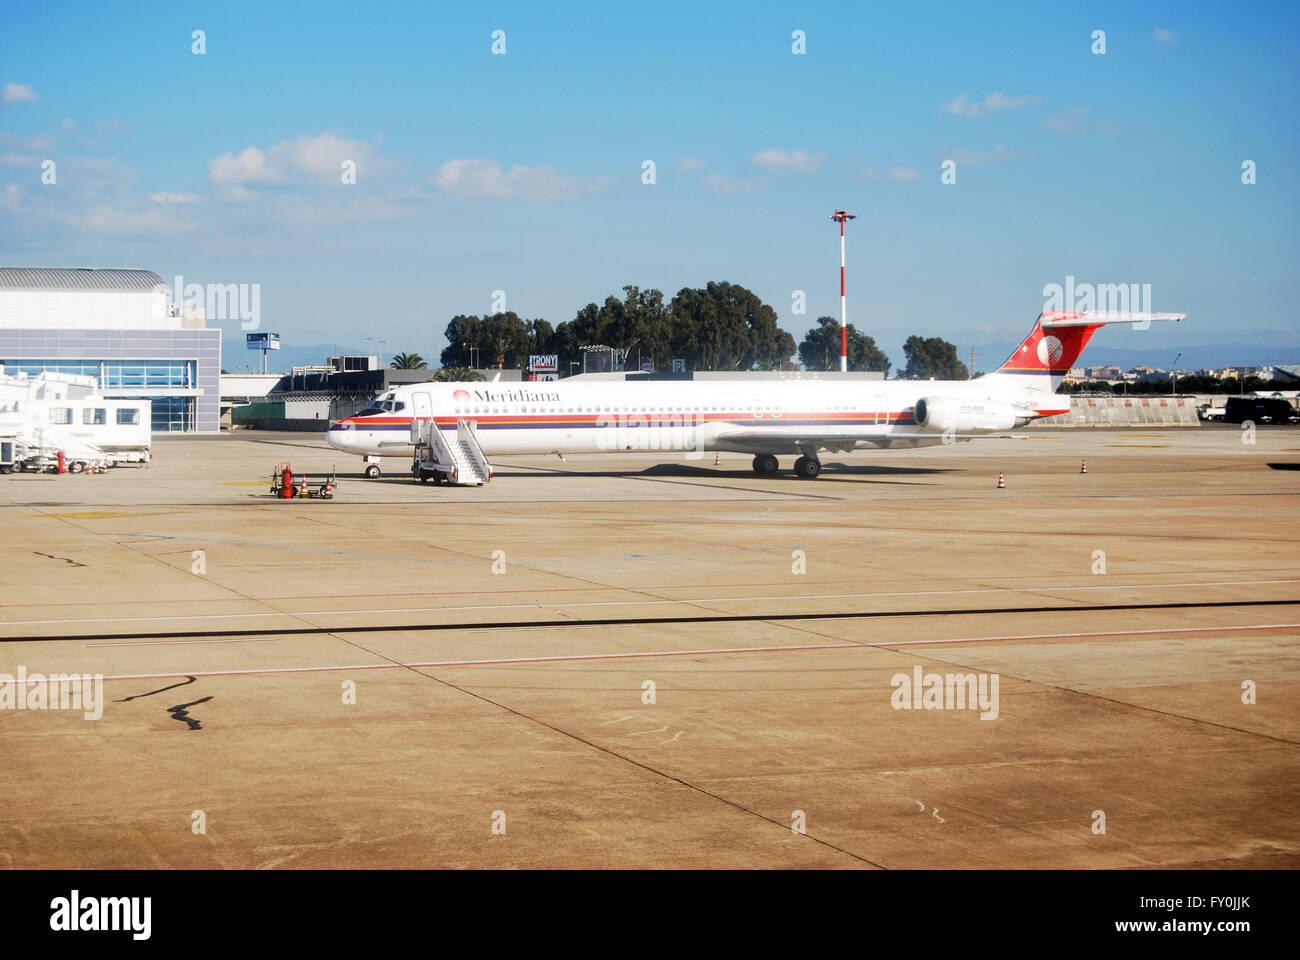 Cagliari, Italien - 24. Januar 2010: Meridiana Flugzeug am Flughafen in Cagliari. Land und tagsüber als redaktionell Stockbild